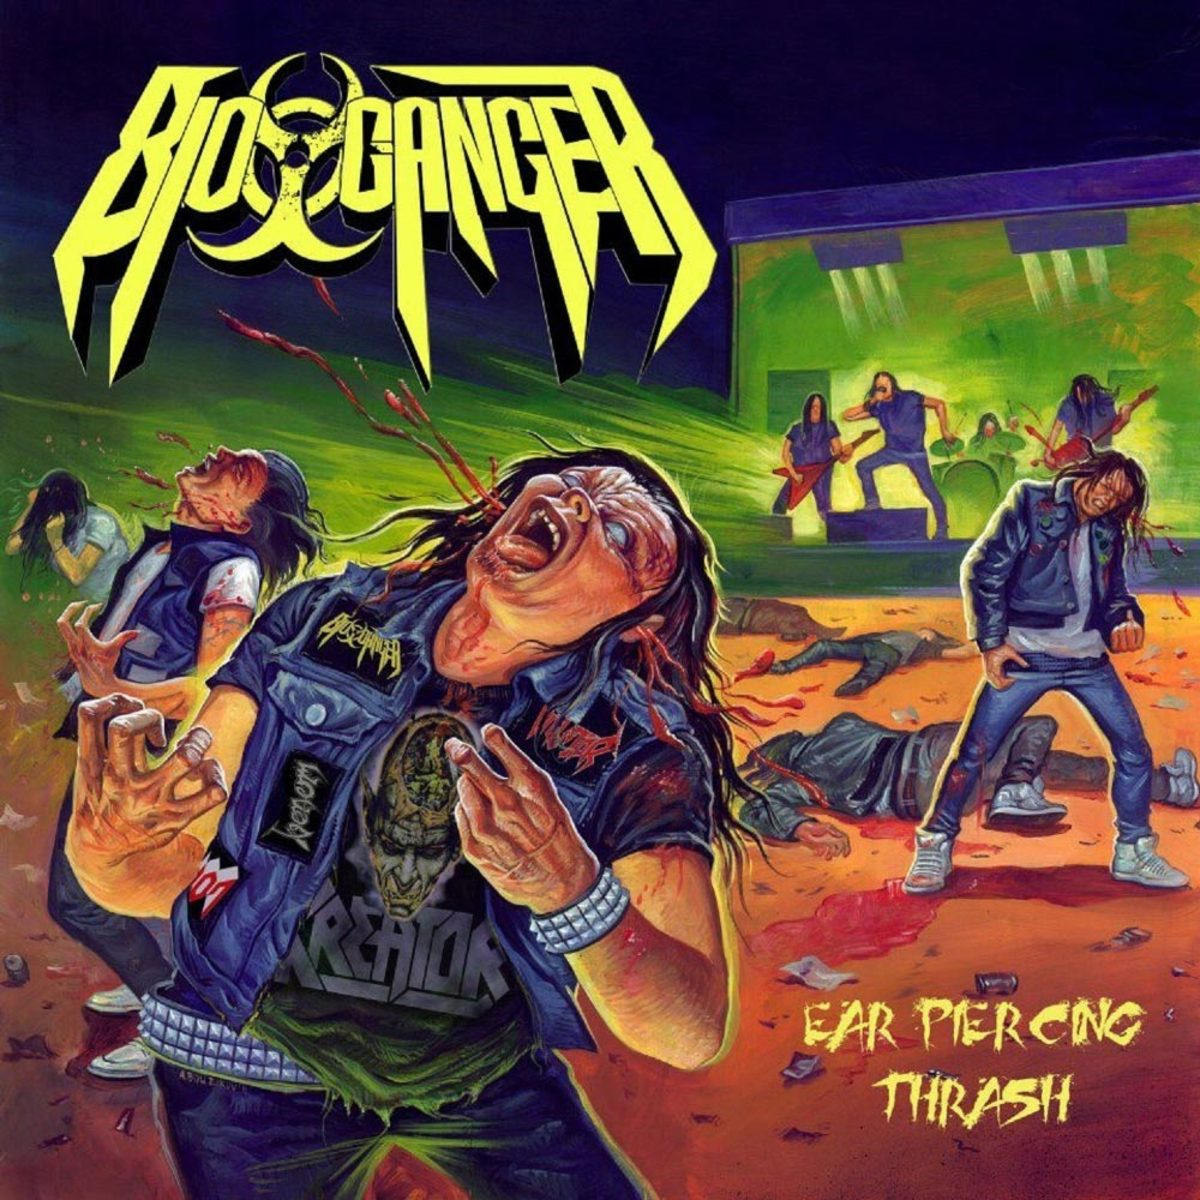 review-of-the-album-ear-piercing-thrash-by-greek-thrash-metal-band-bio-cancer